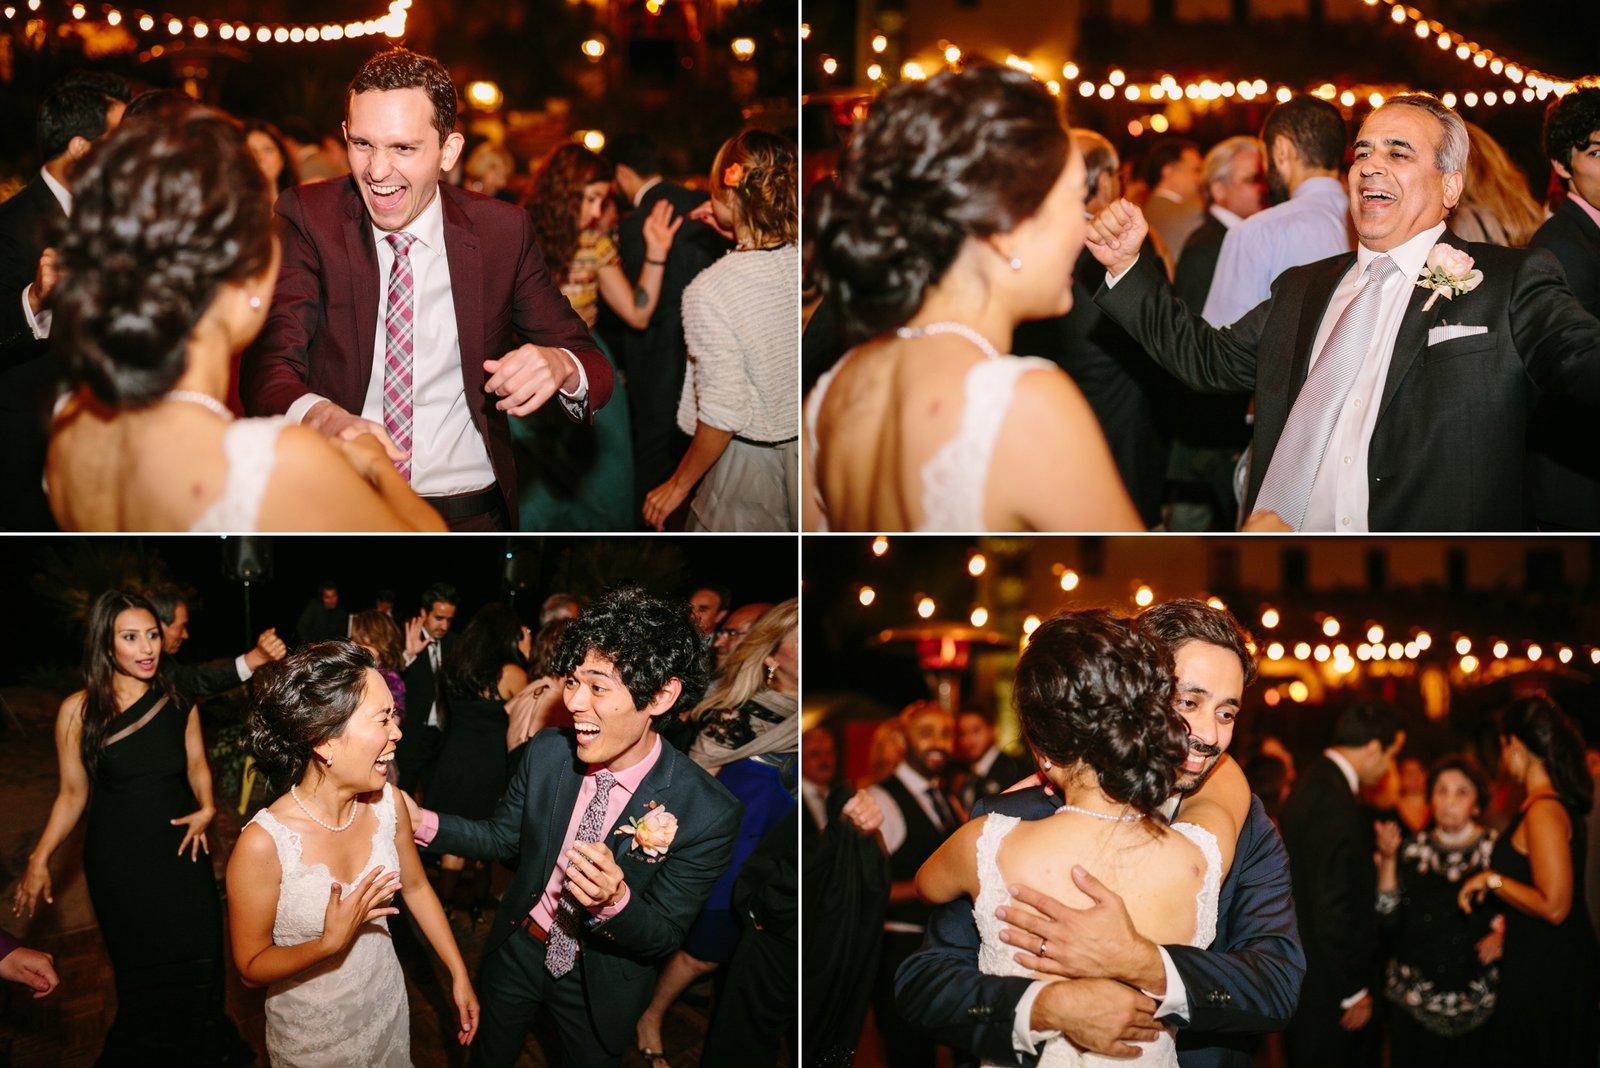 Wedding Photos-Jodee Debes Photography-149